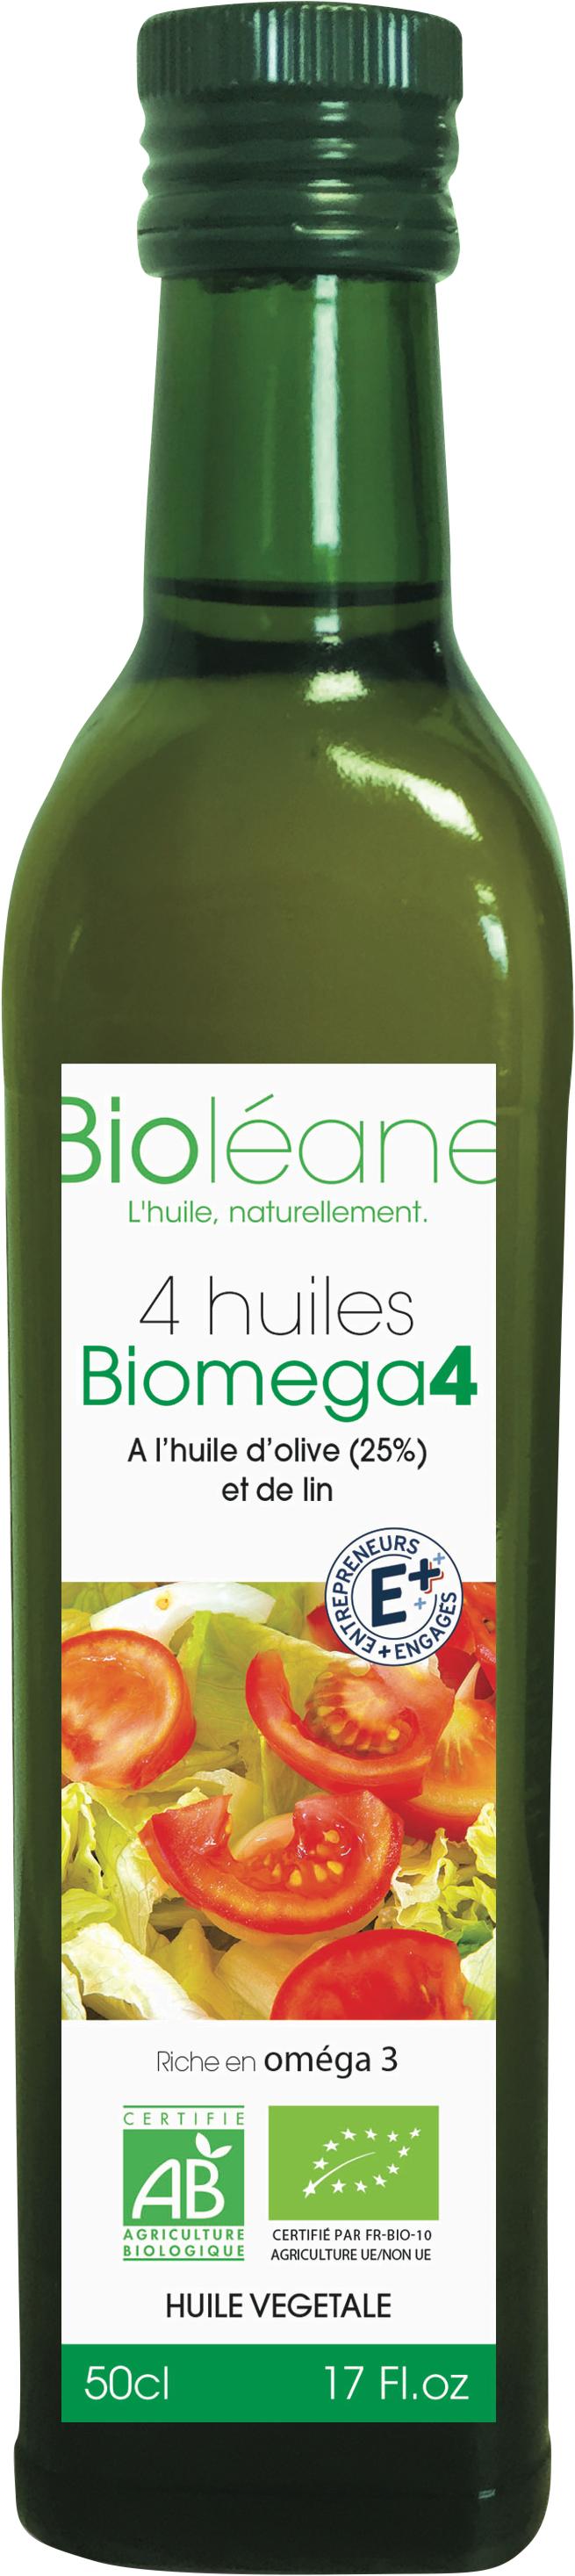 Mélange 4 huiles vierges Bio Biomega 4 Biolena (50 cl)